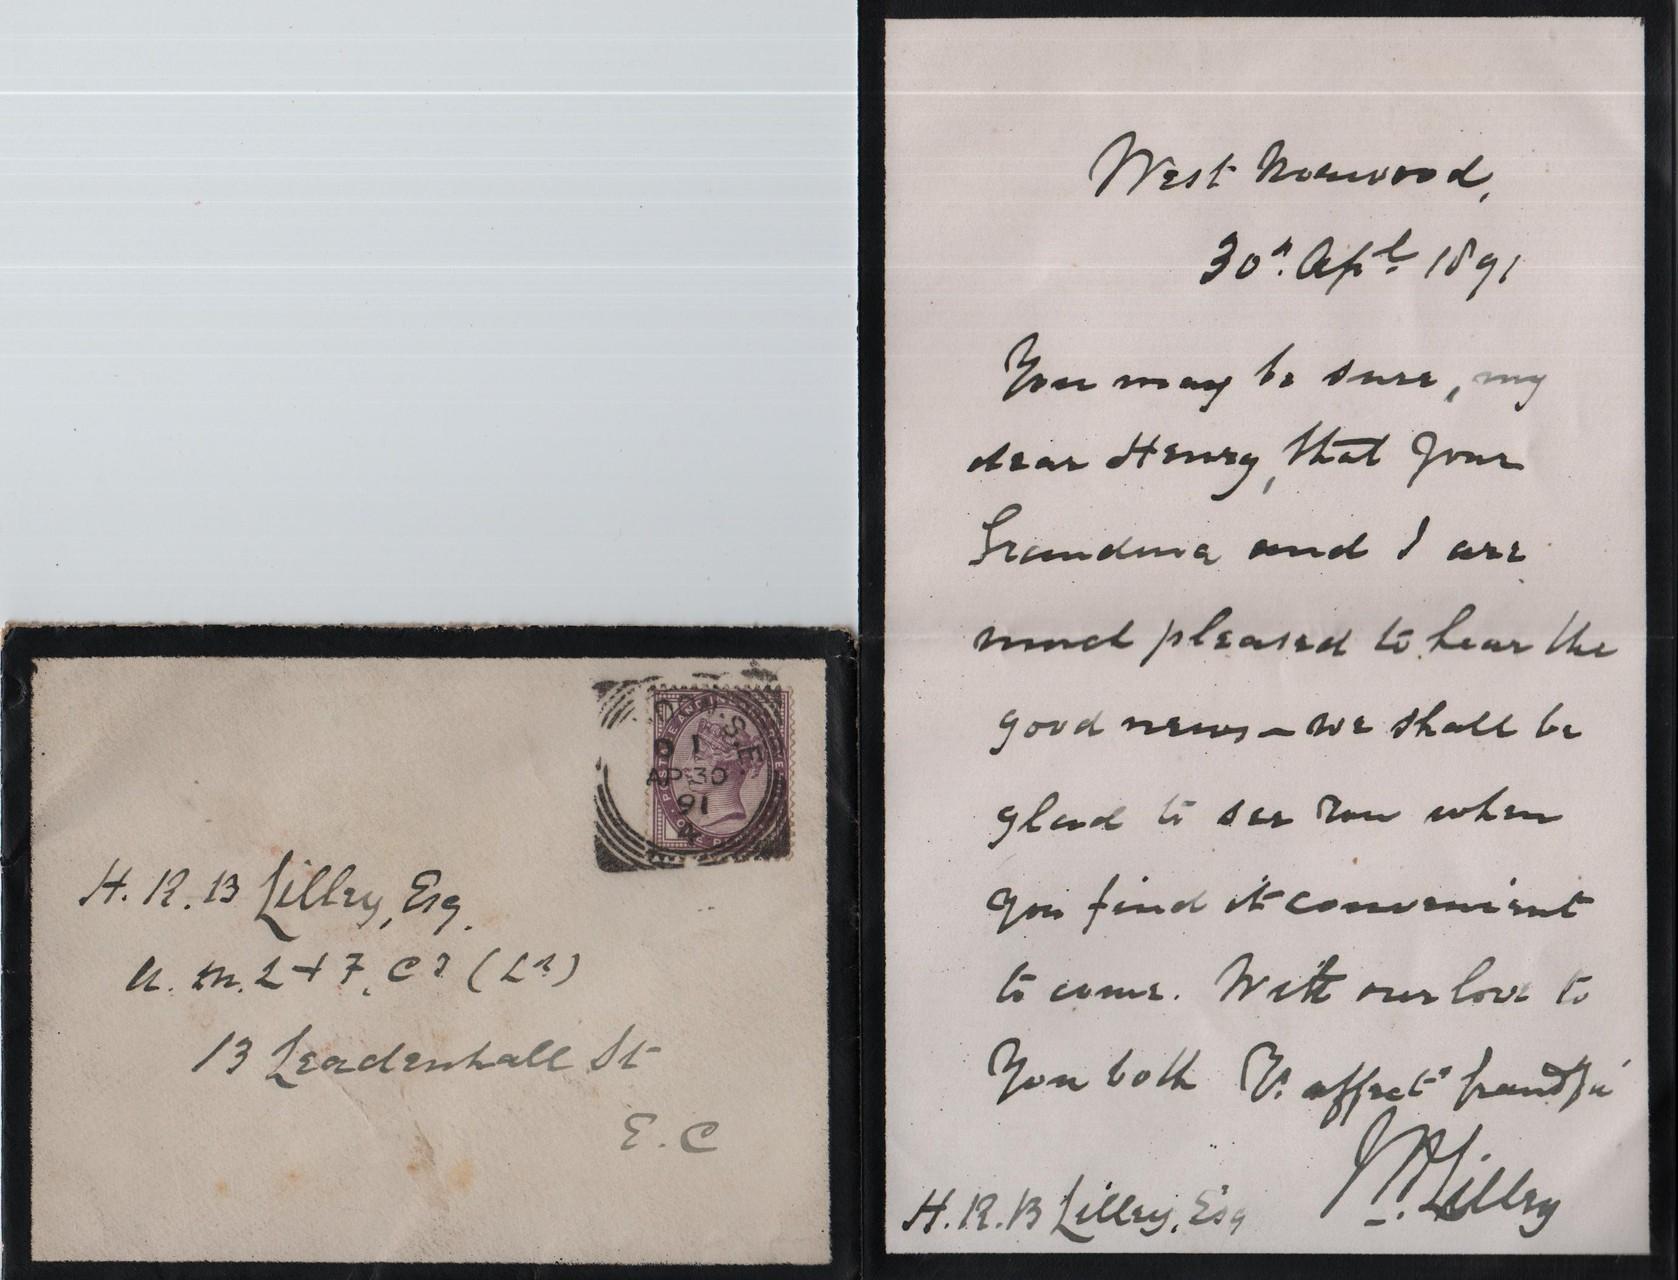 1891 April 30th JHL to HRBL